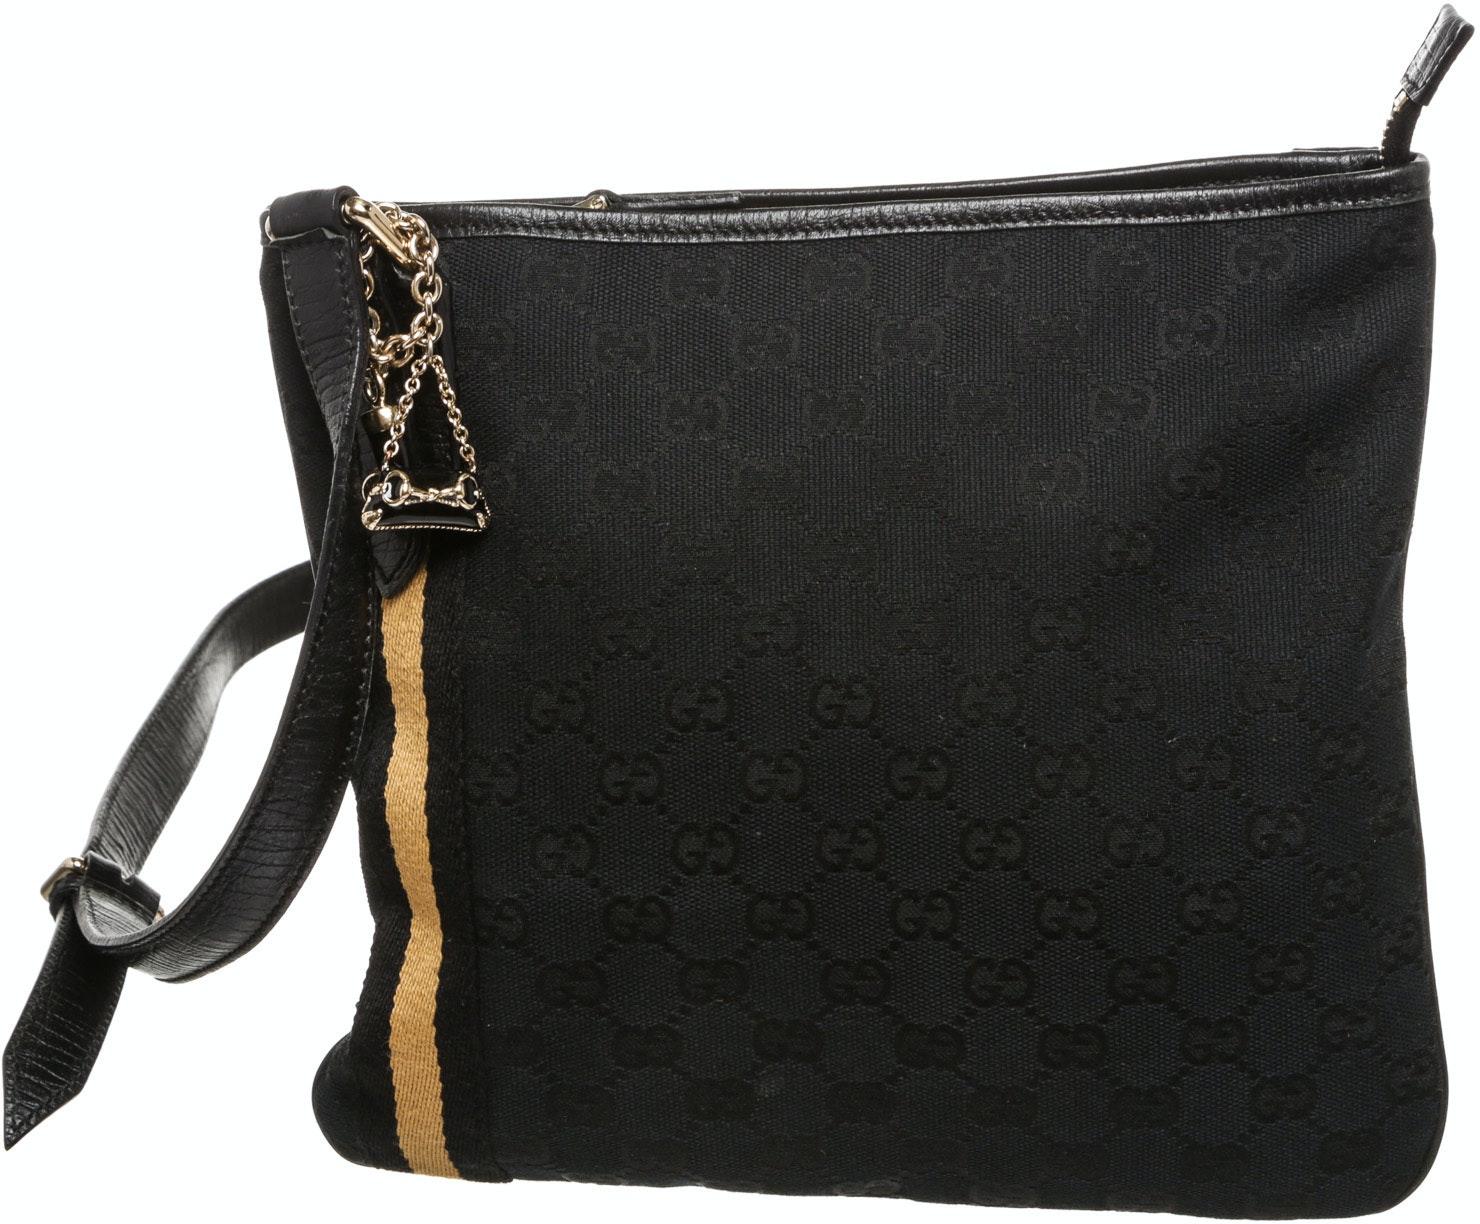 Gucci Web Jolicoeur Charms Messenger Monogram GG Black